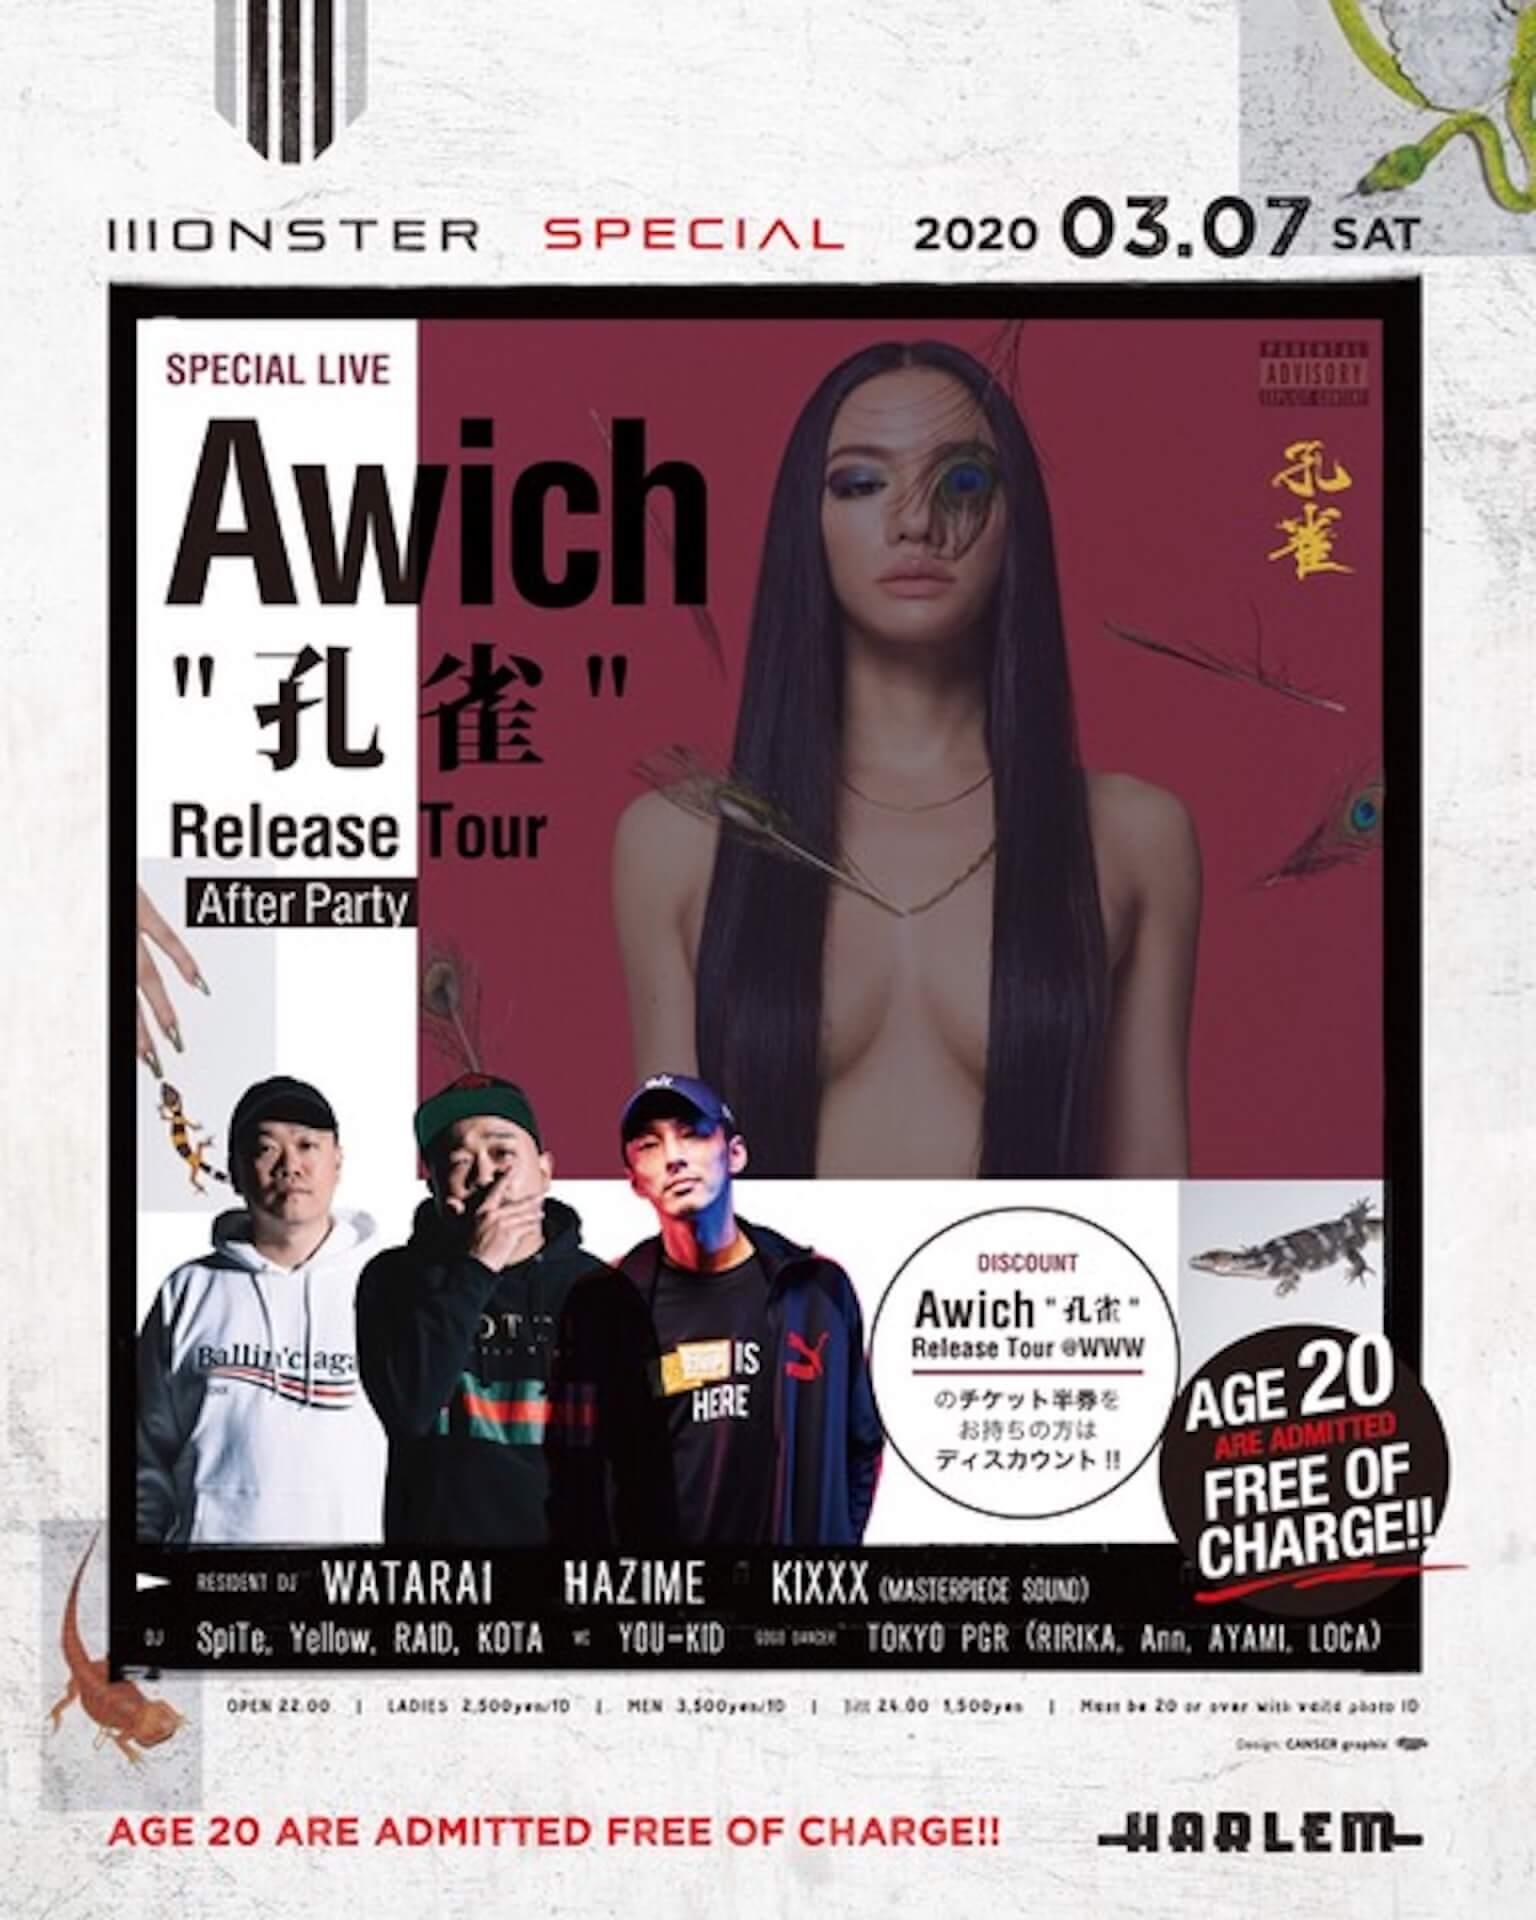 "Awich最新作『孔雀』から""洗脳""のMVが公開!チケットが完売したWWW Xワンマンのアフターパーティも開催決定 music200225_awich_sennoumv_01"